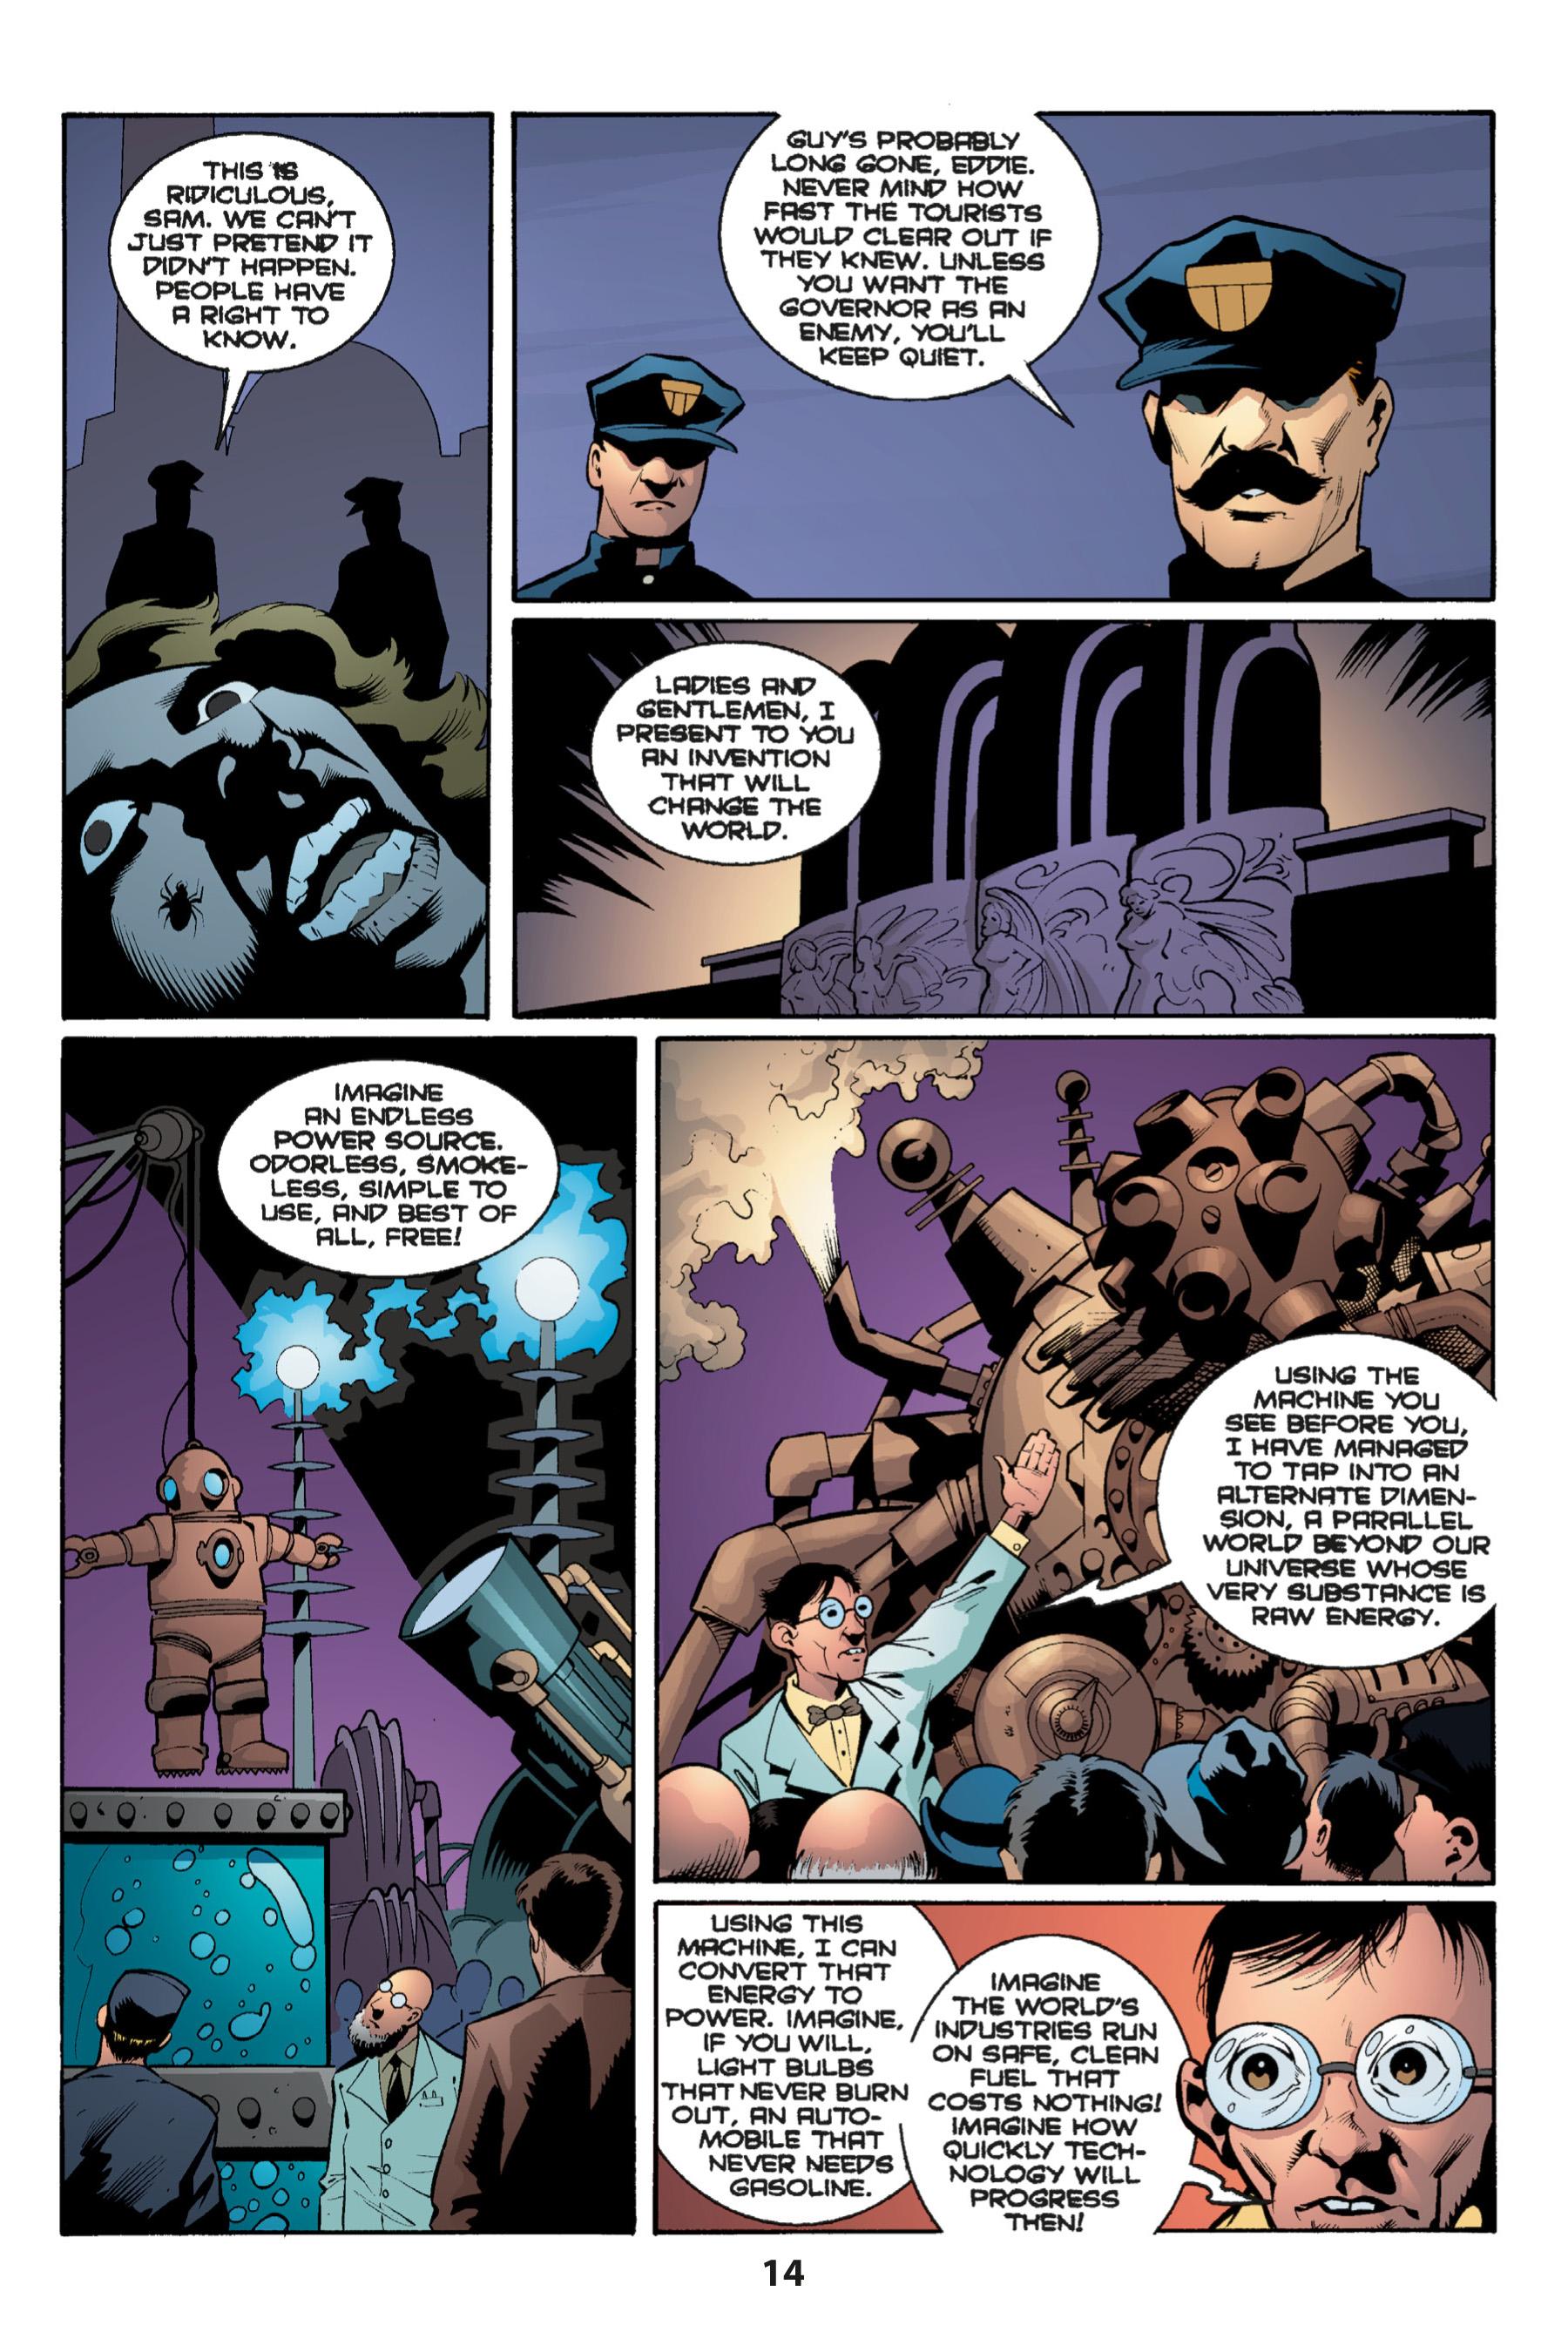 Read online Buffy the Vampire Slayer: Omnibus comic -  Issue # TPB 1 - 16